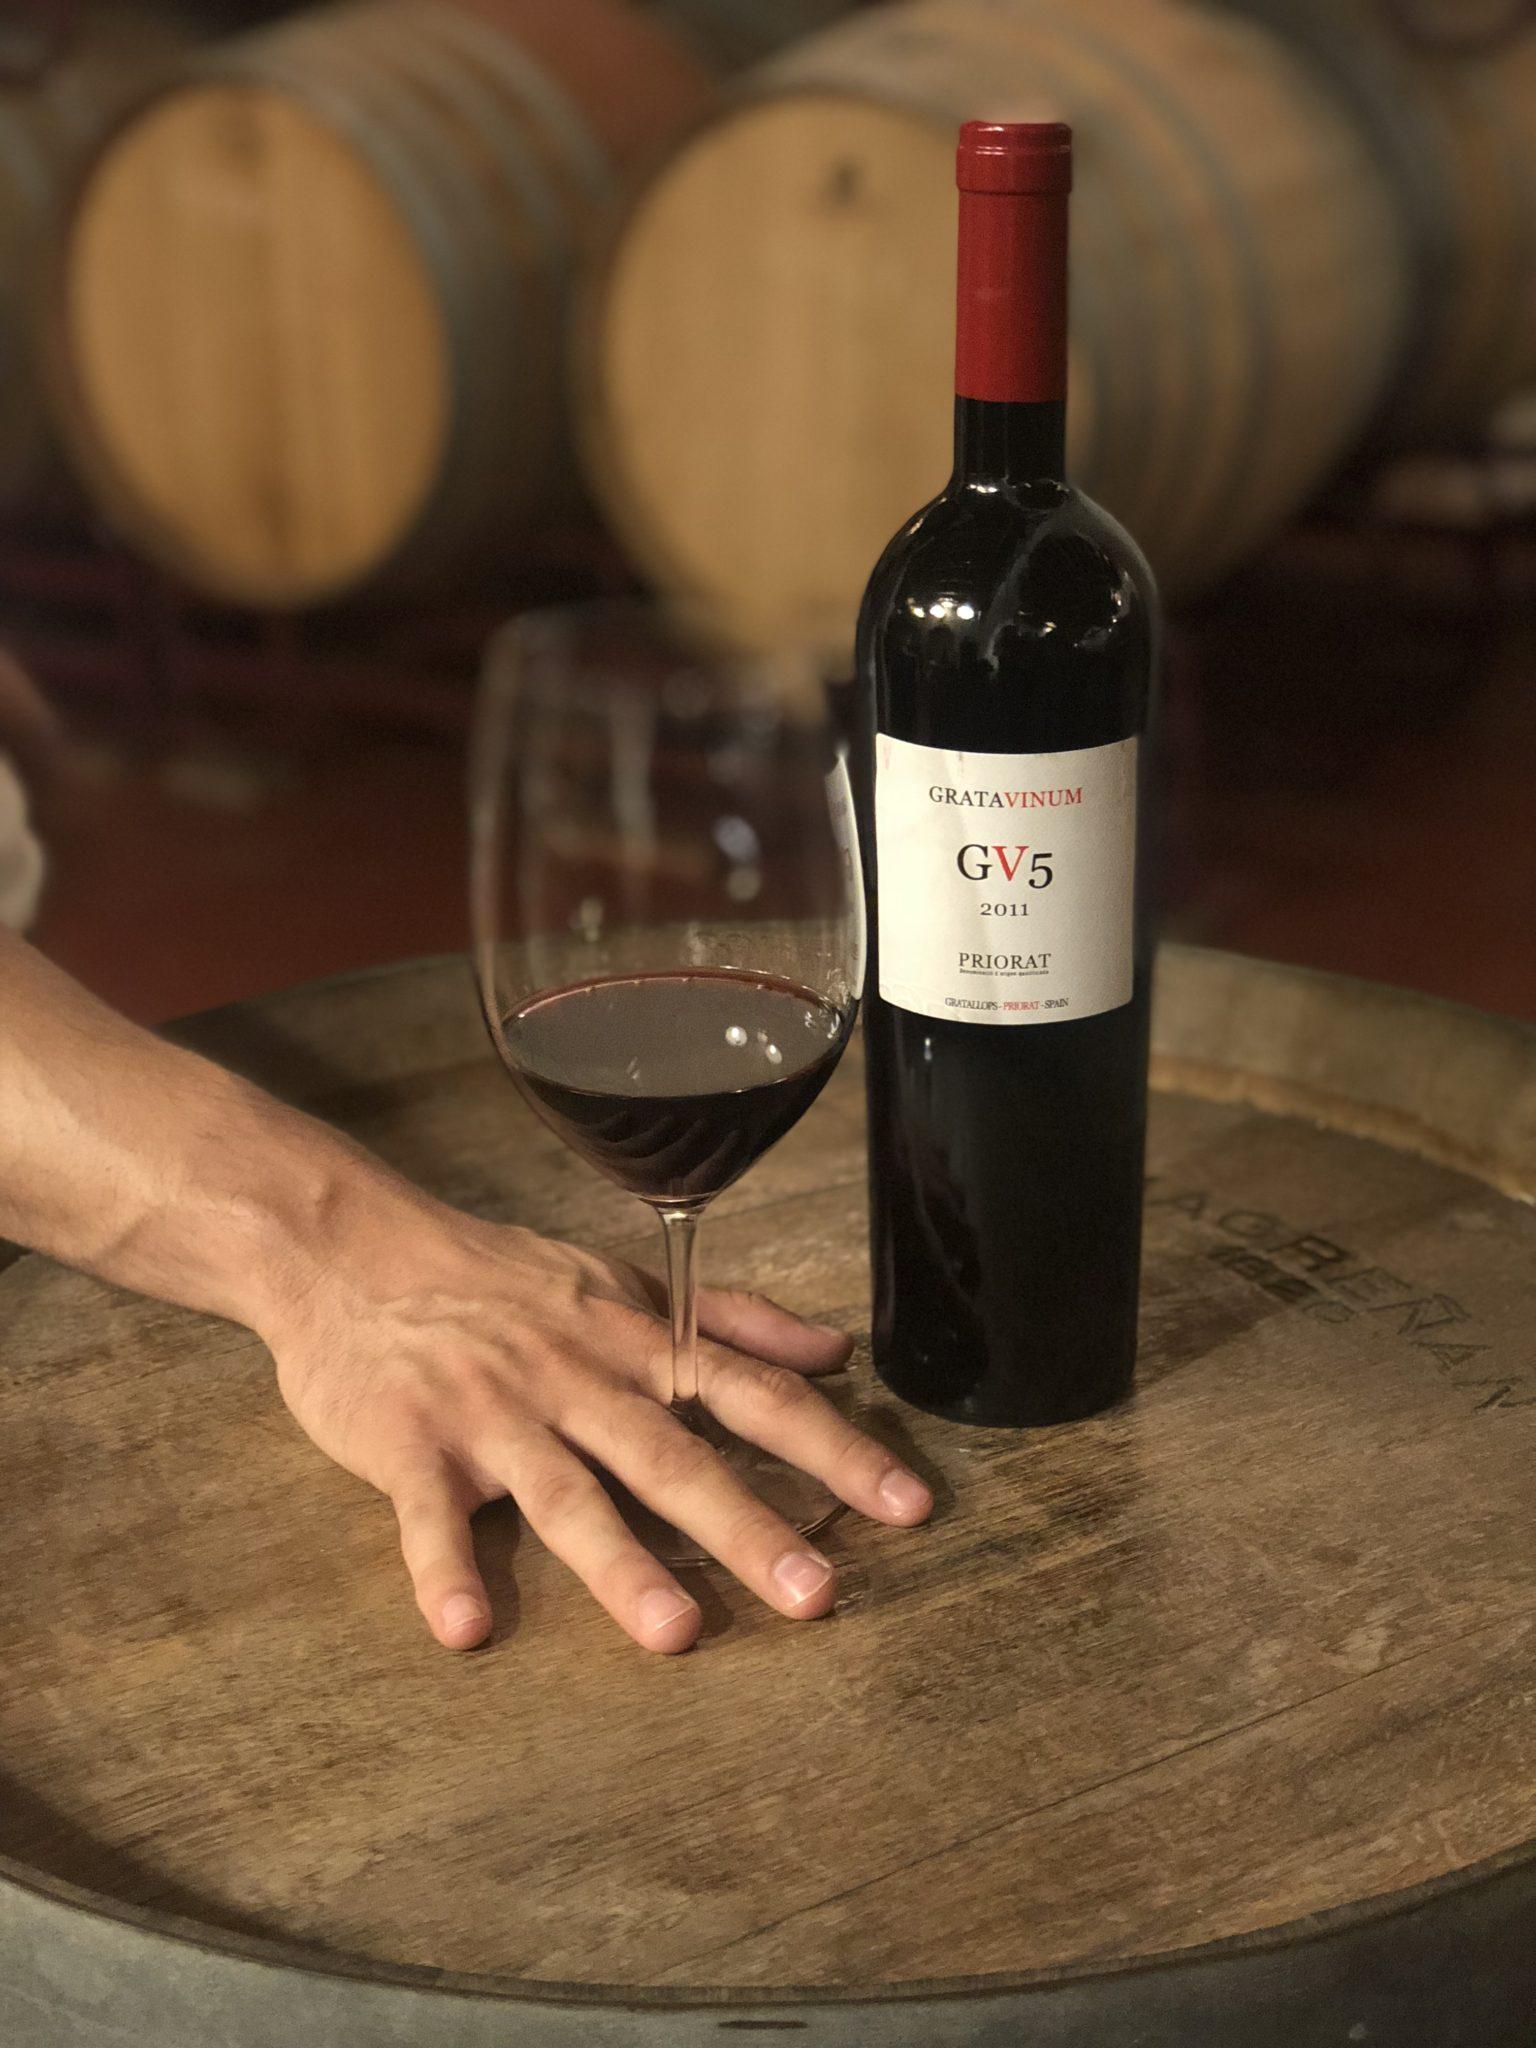 Tast al celler de Gratavinum, vins ecològics al Priorat